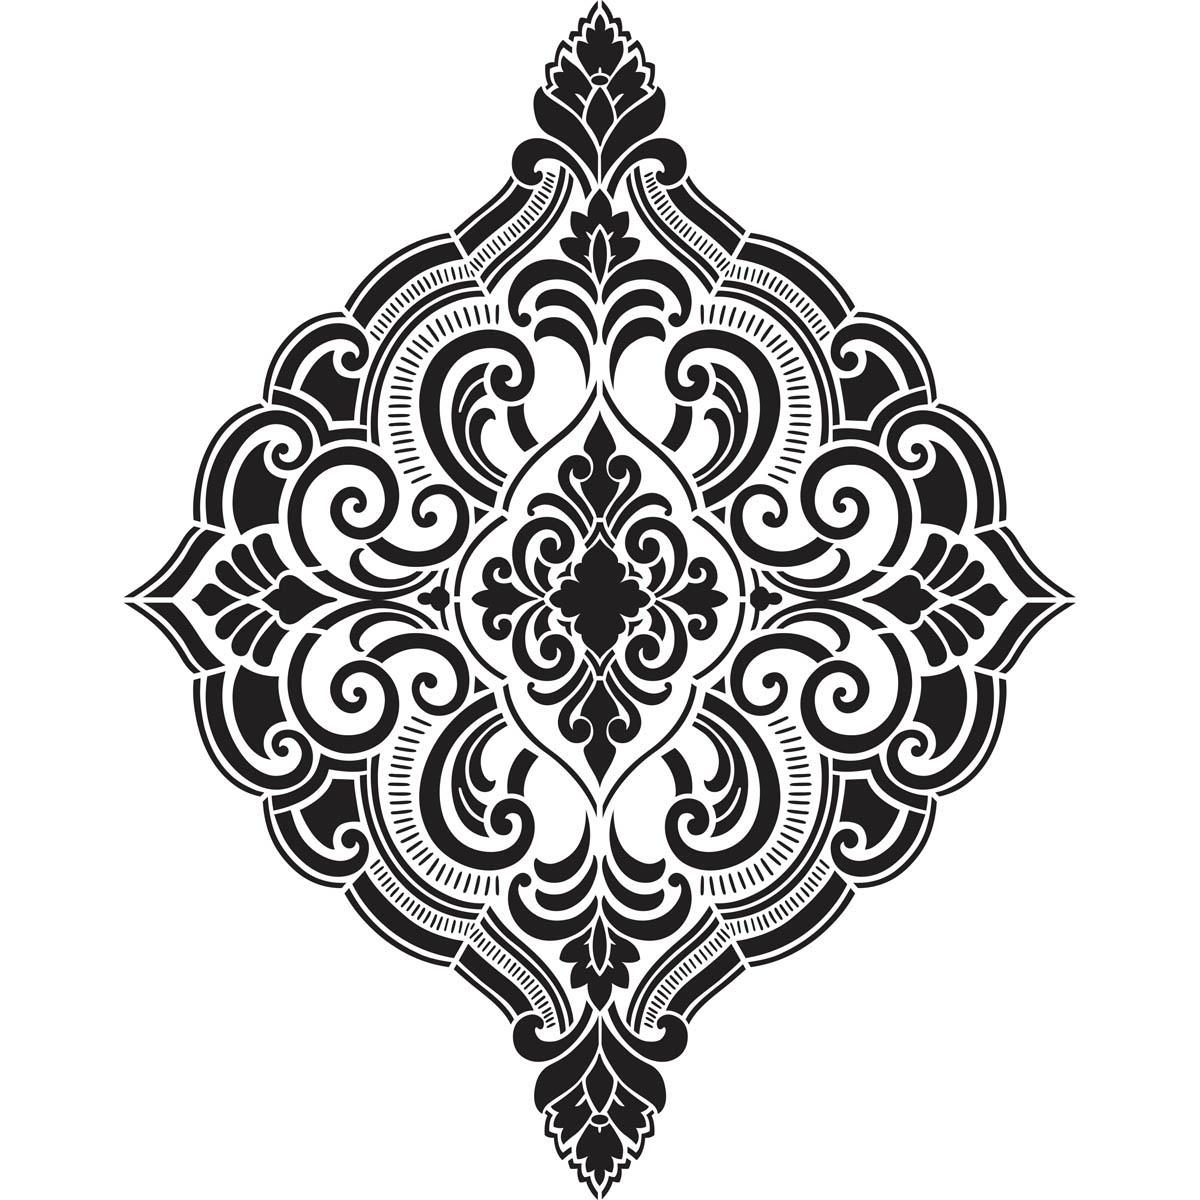 FolkArt ® Home Decor™ Wall Stencils - Ornate Damask